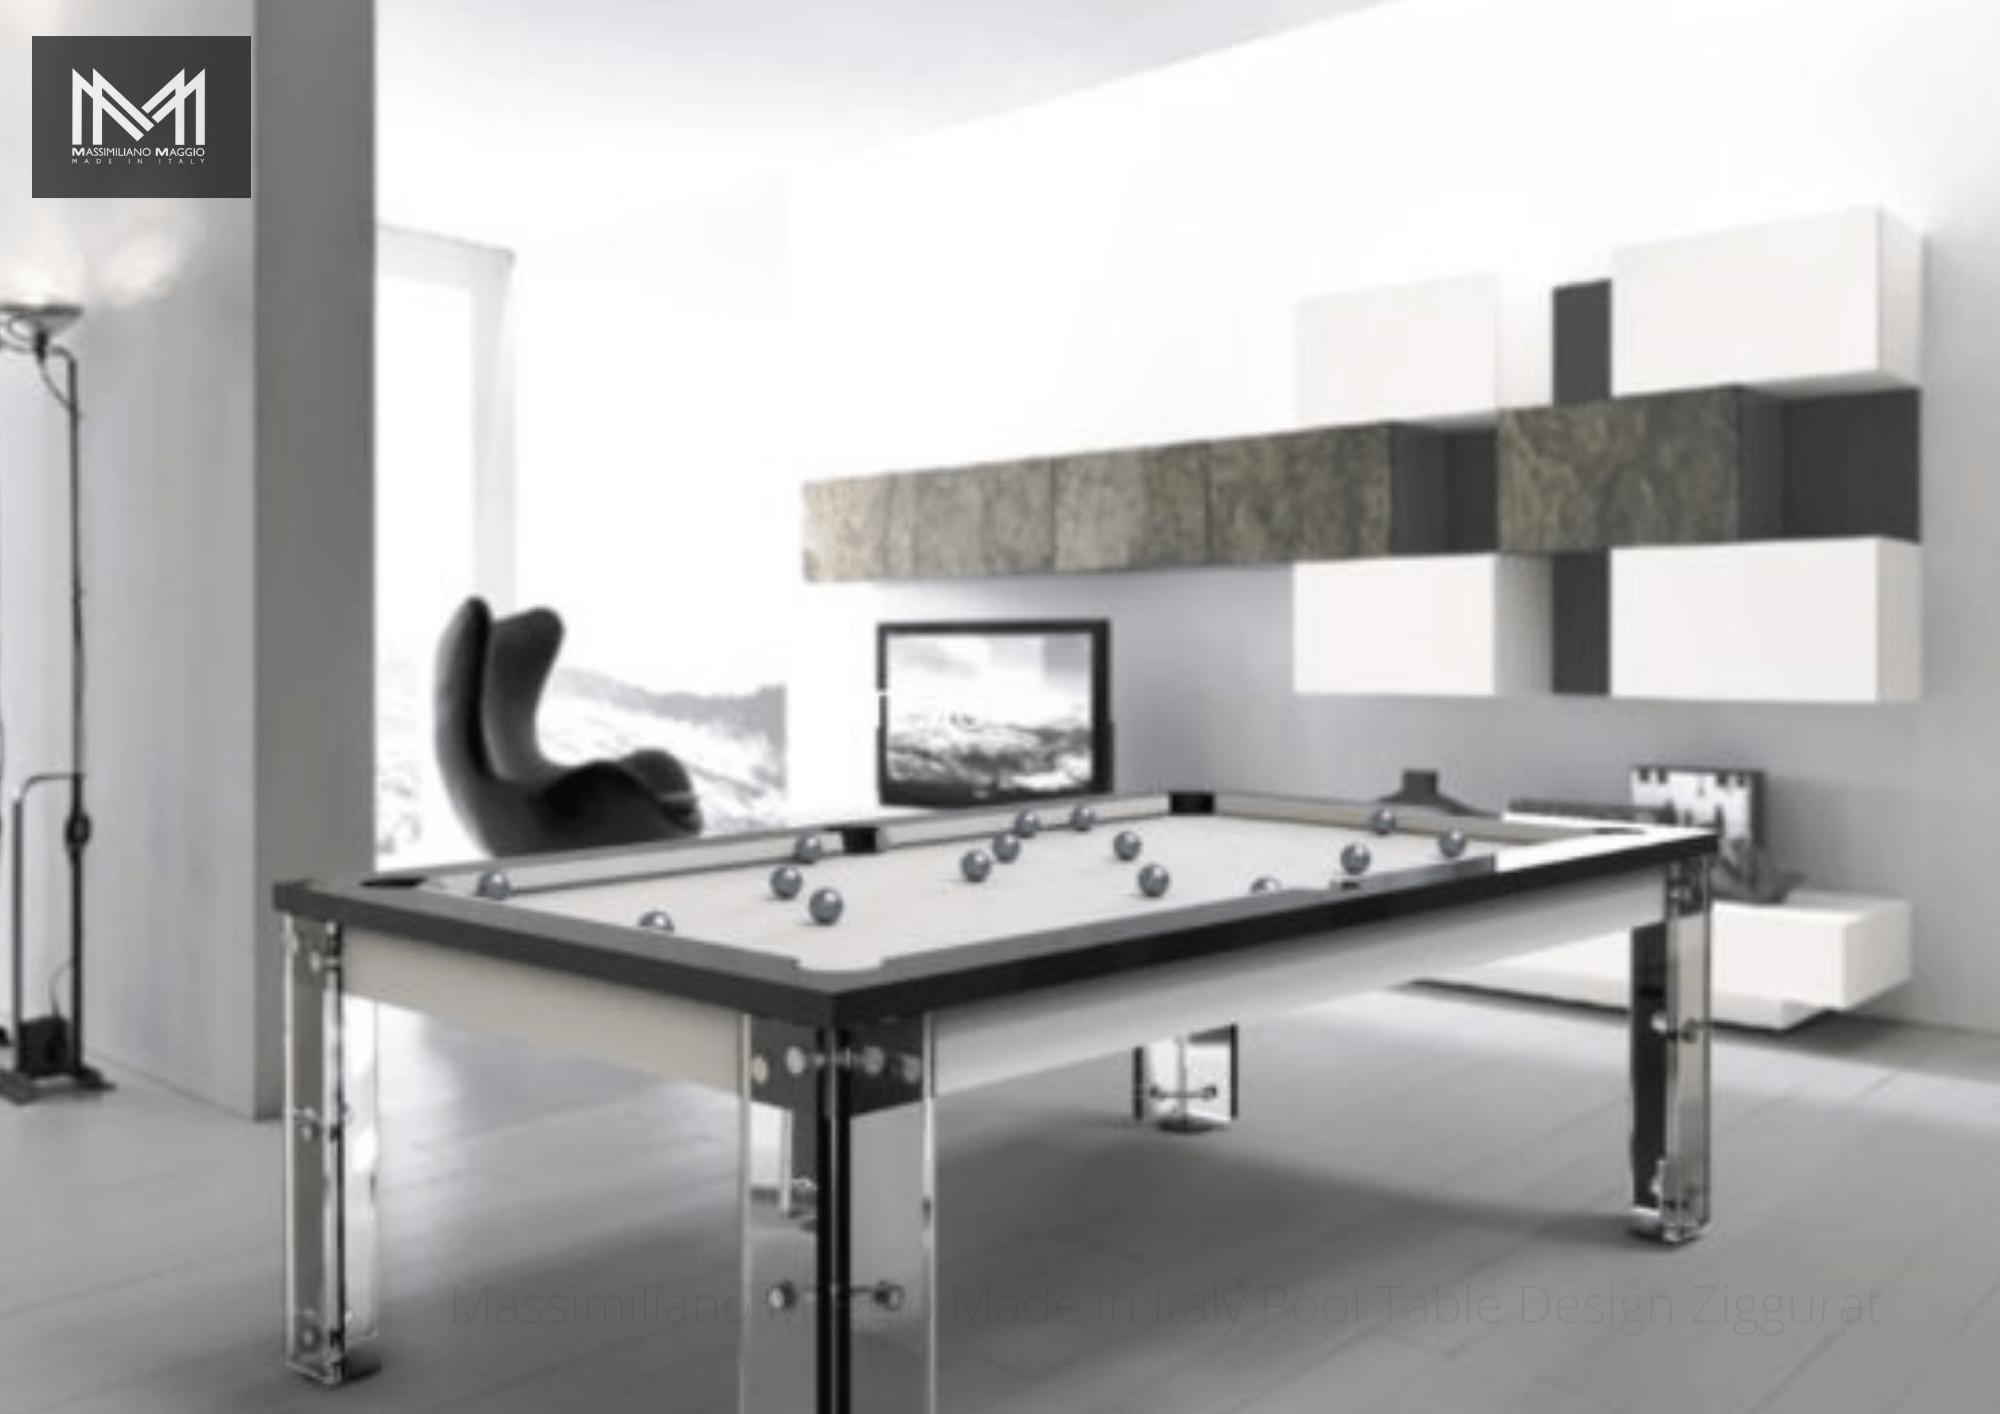 2 M13 Massimiliano Maggio Made in Italy Luxury Pool Table Ziggurat biliardo tavolo.png.png.png